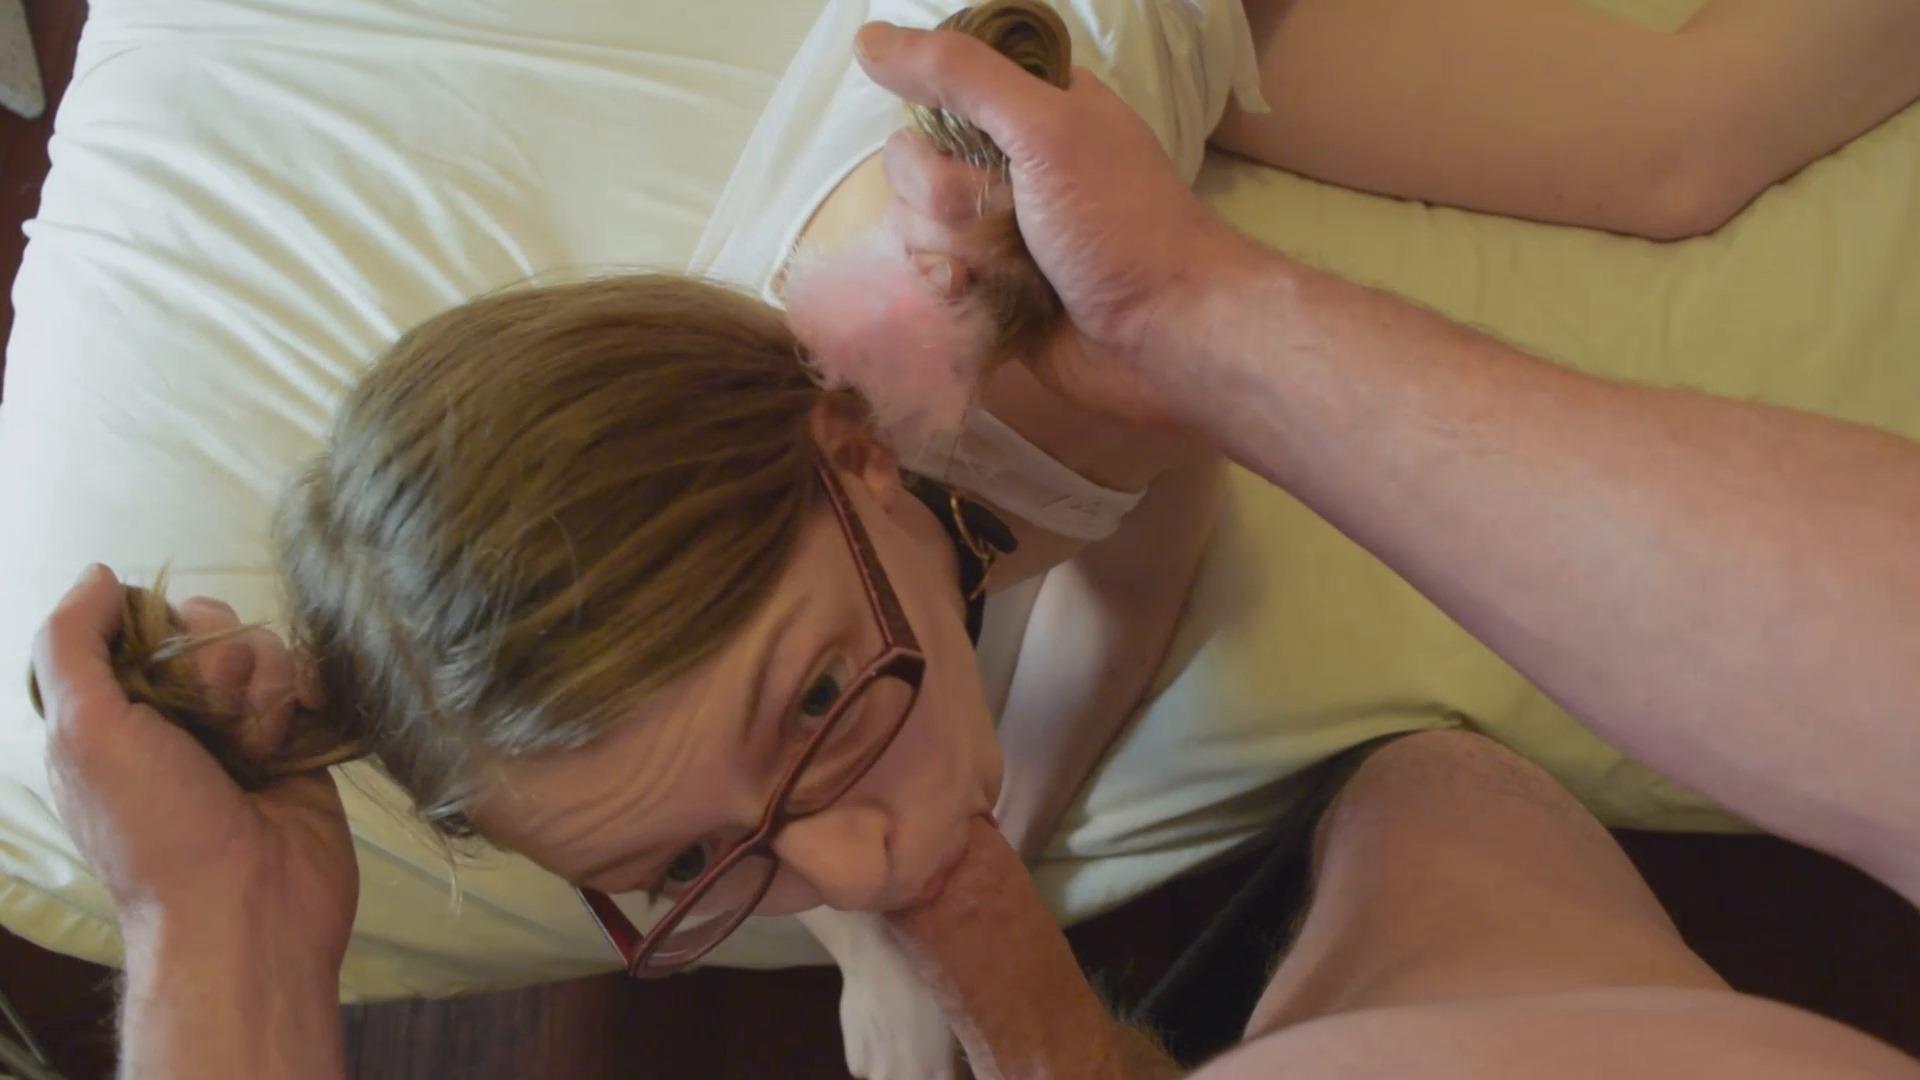 Daddy Cums Inside Daughter